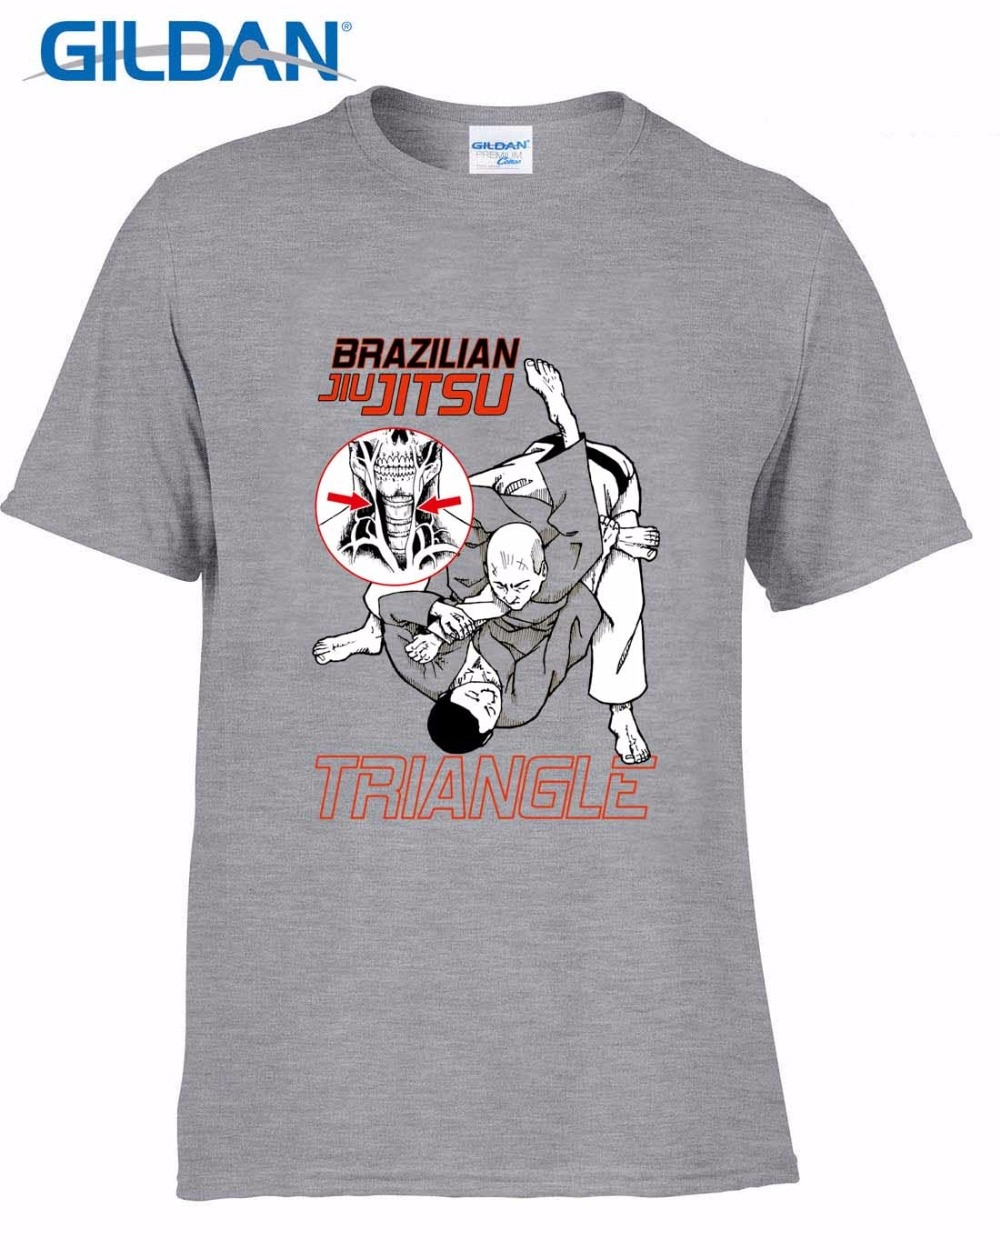 2019 nueva venta caliente 100% algodón llegada Stringer hombres gratis China Post Shipping Bjj brasileño Jiu Jitsu triángulo camiseta